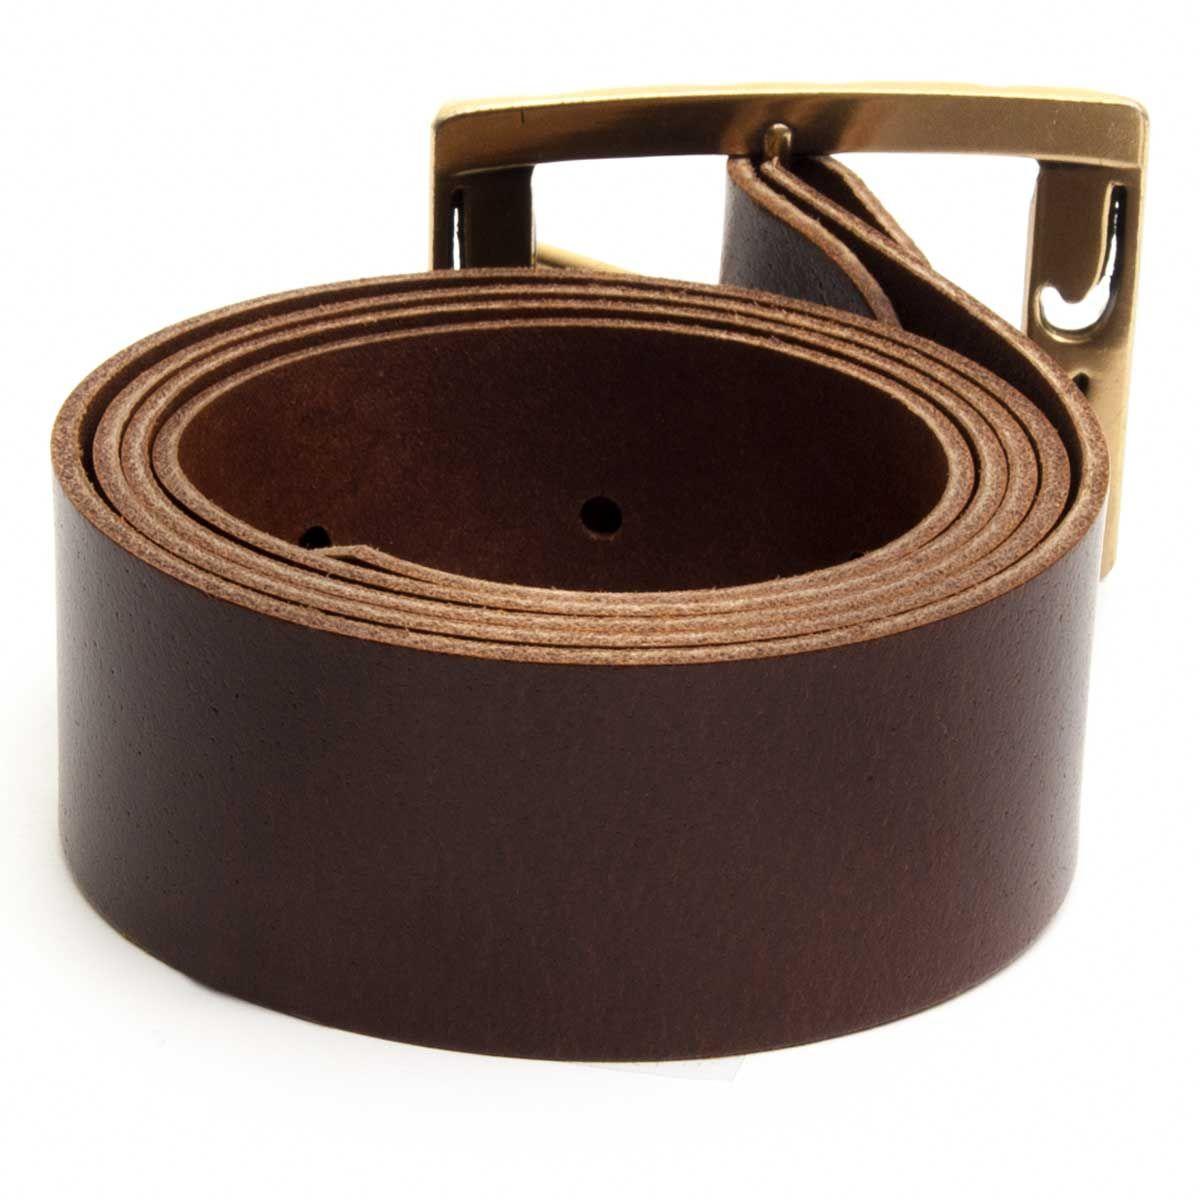 Montevita Casual Quality Belt in Camel